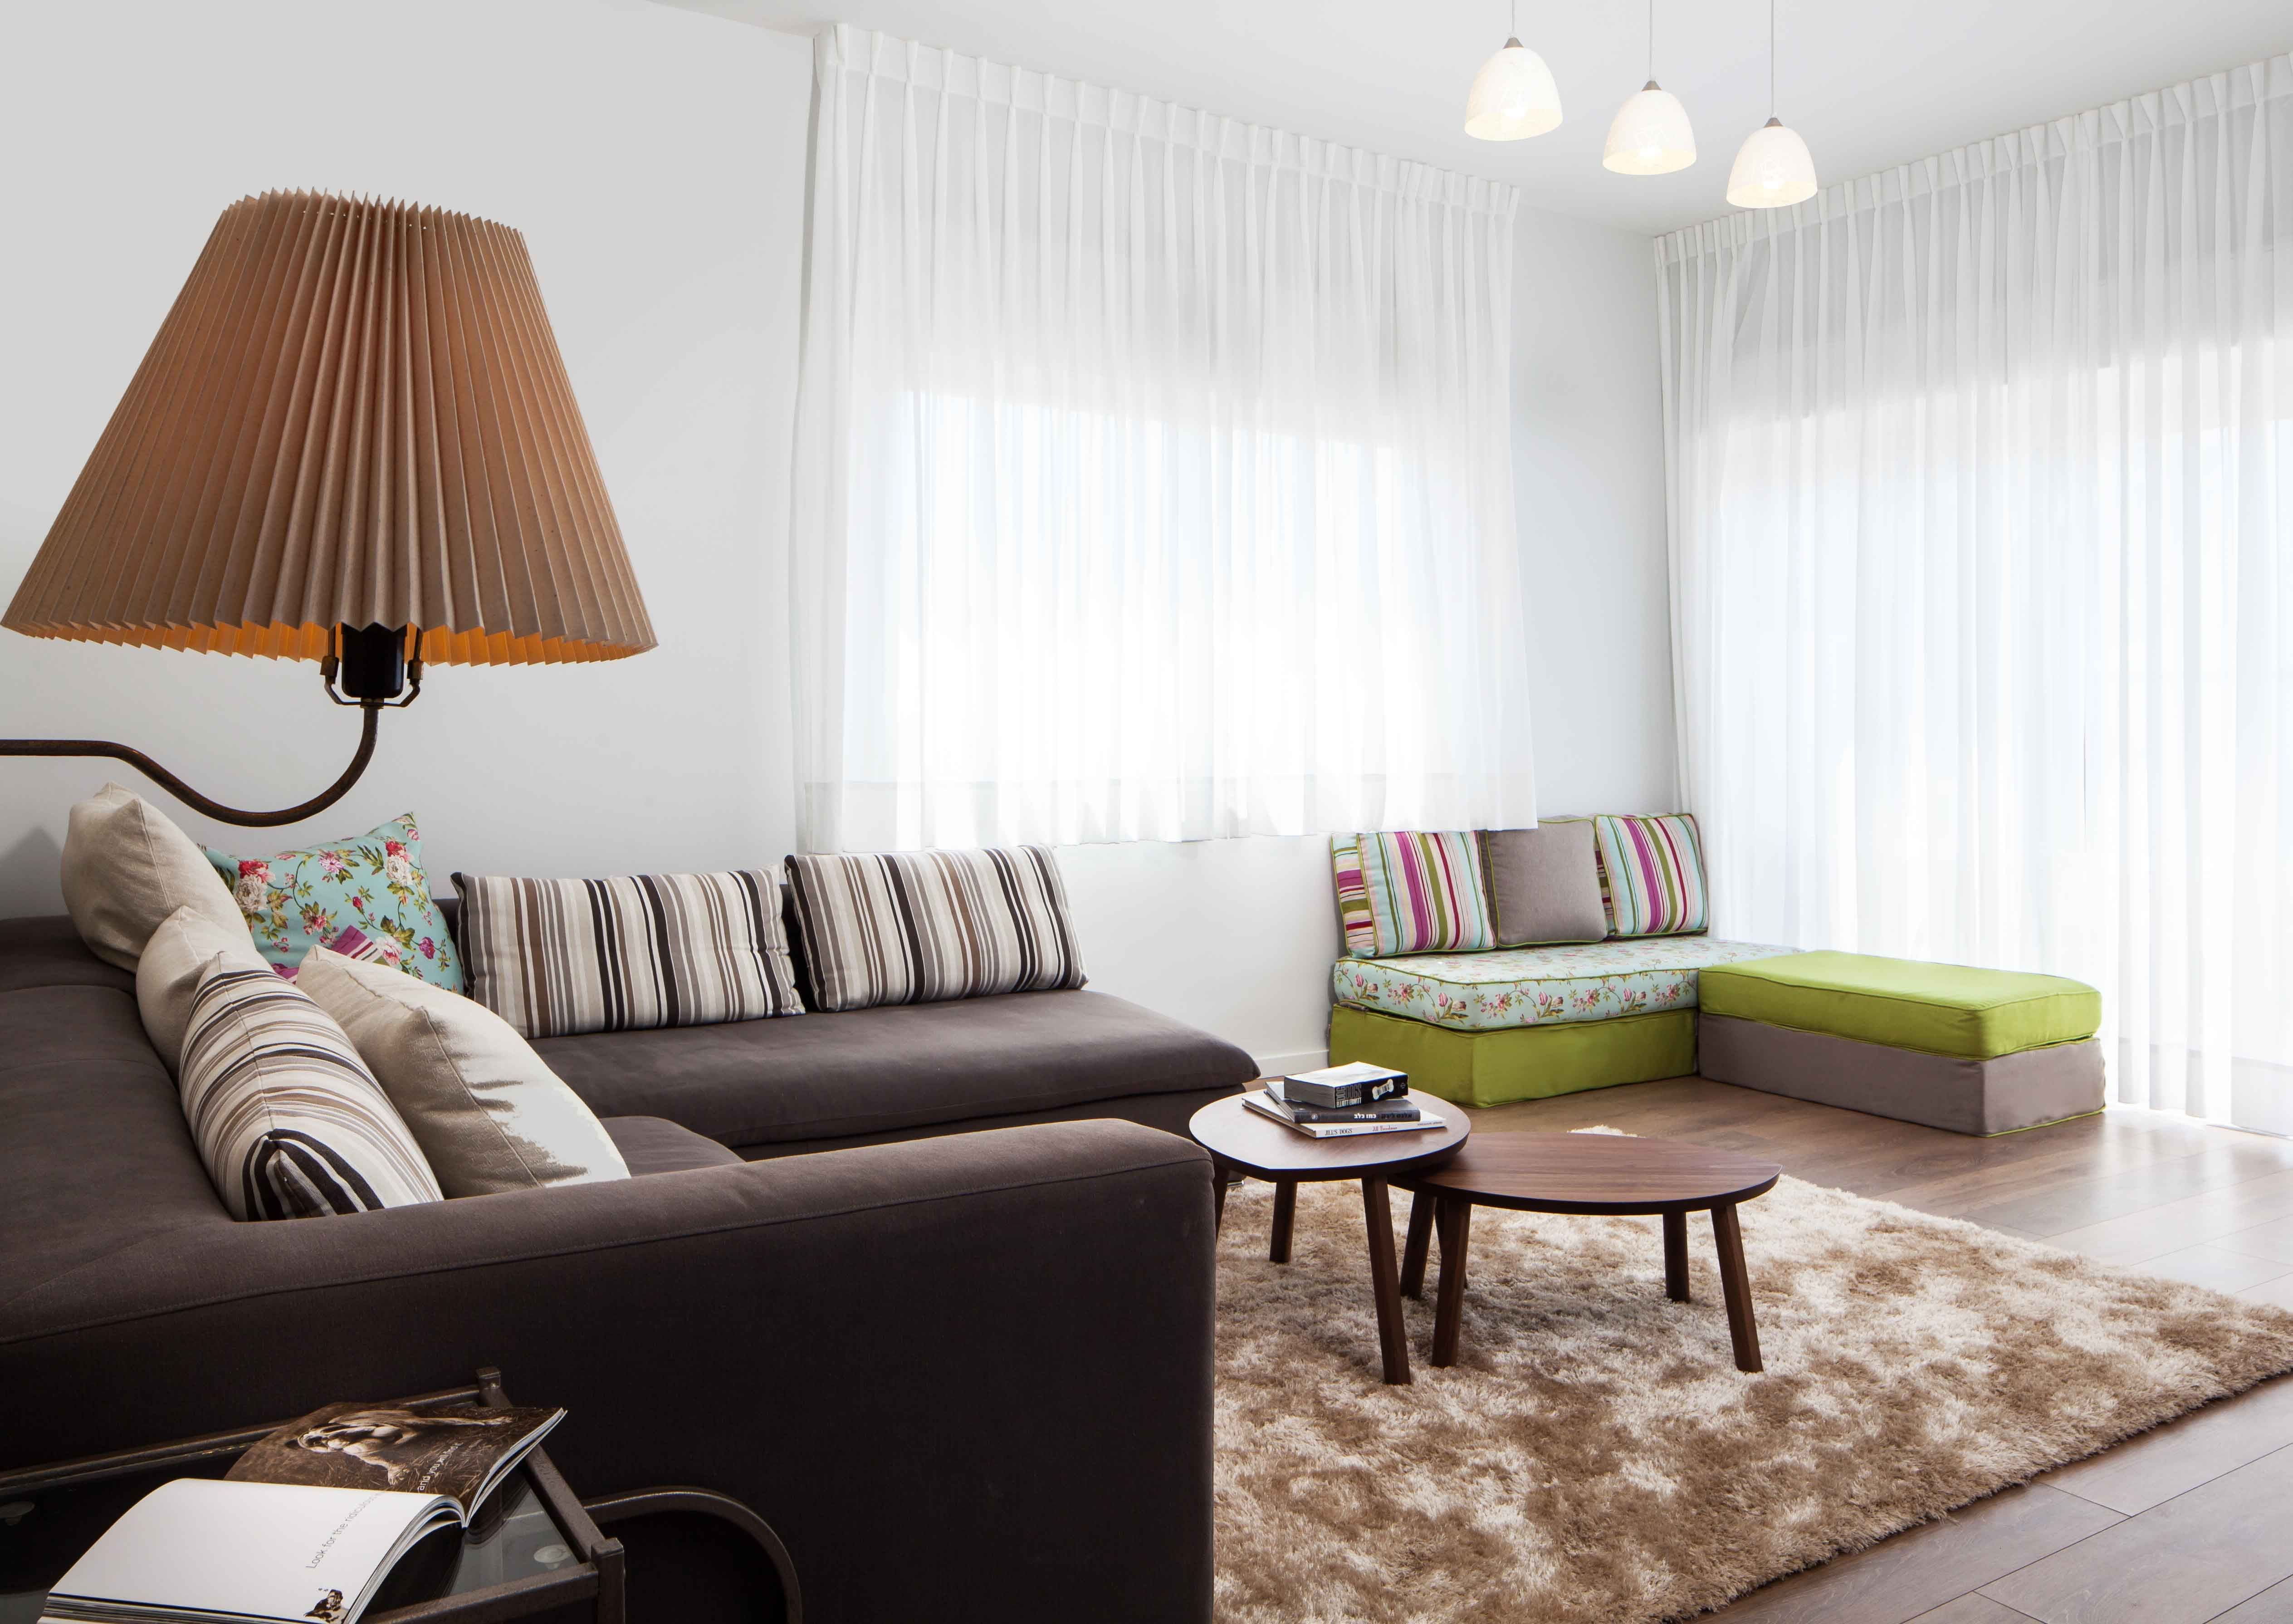 Renovation and design of an apartment on the slopes carmel konvalinka homedecor beautifulhomes interior livingroom also rh pinterest